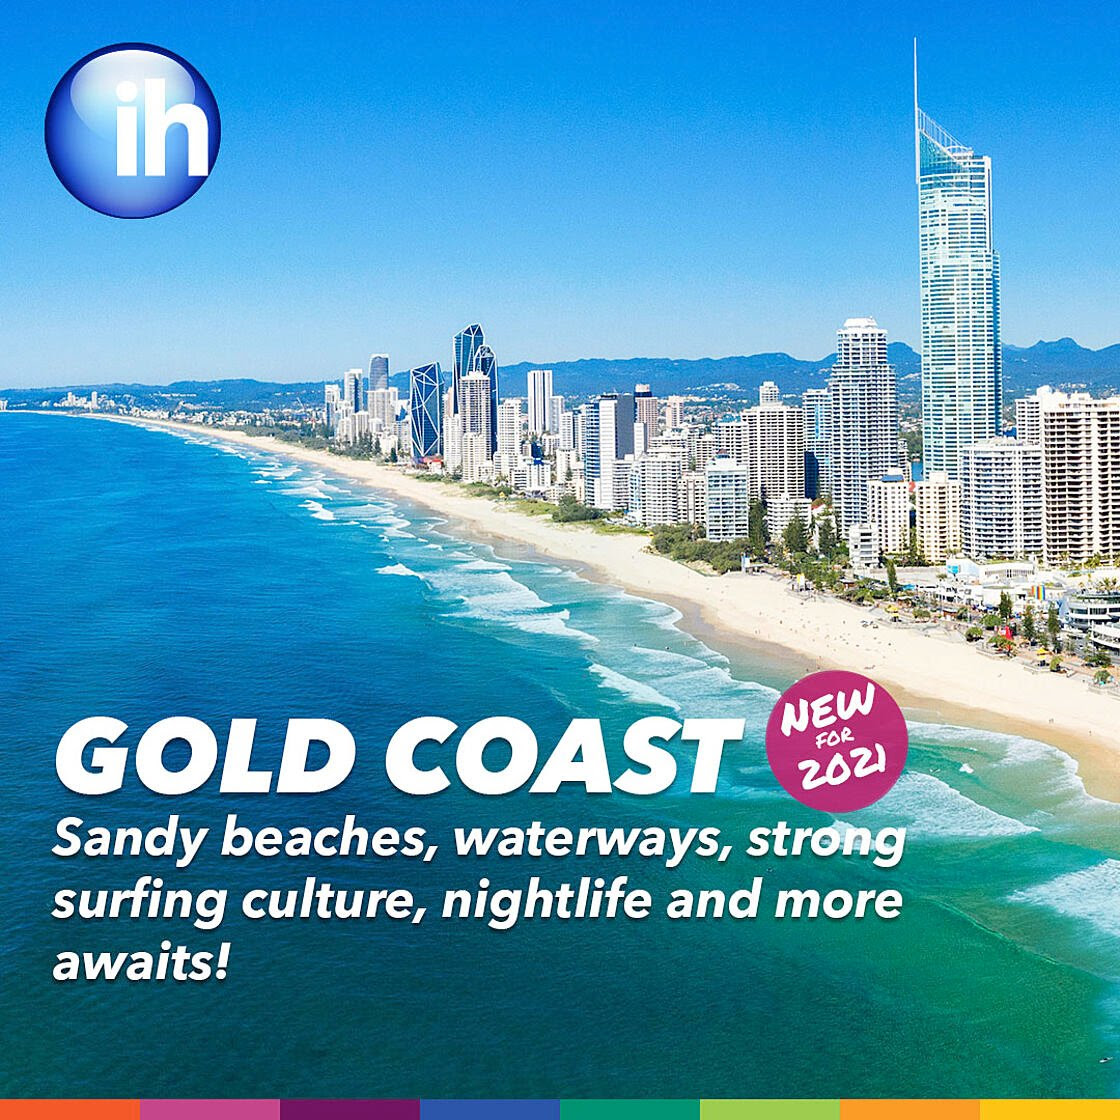 IH Onshore – Gold Coast